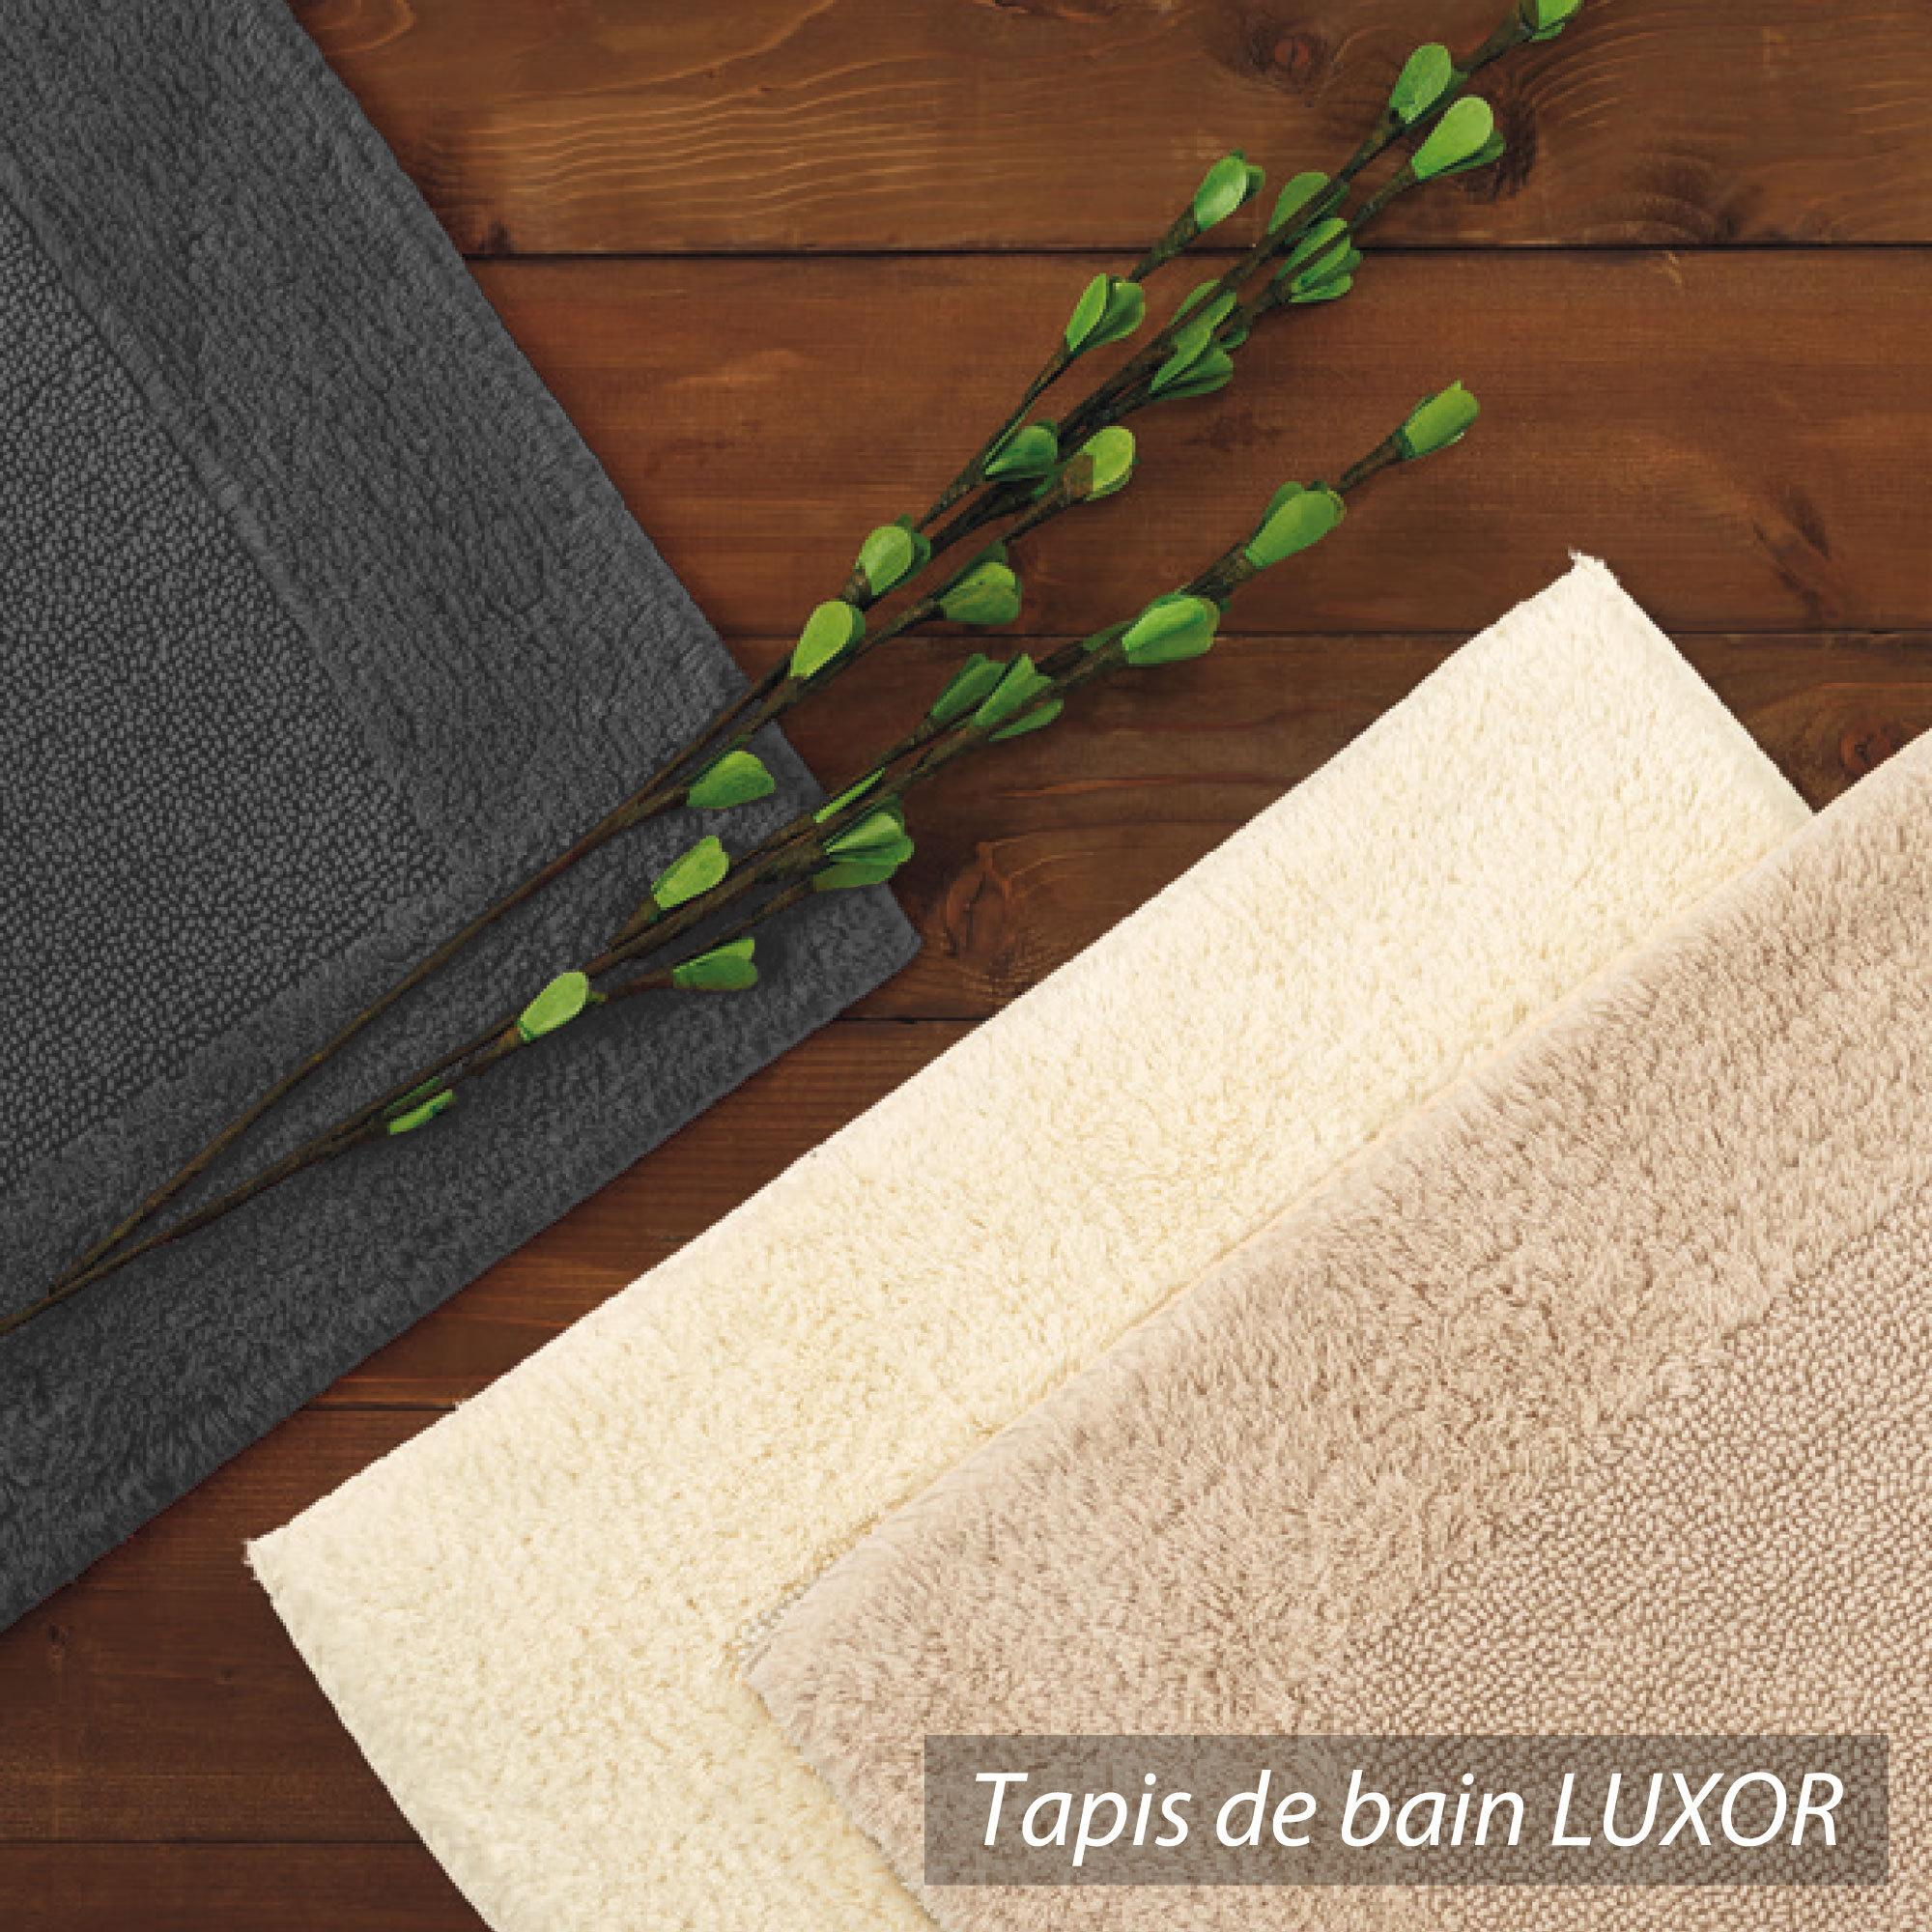 tapis de bain 60x90 luxor beige 2000g m2 ebay. Black Bedroom Furniture Sets. Home Design Ideas